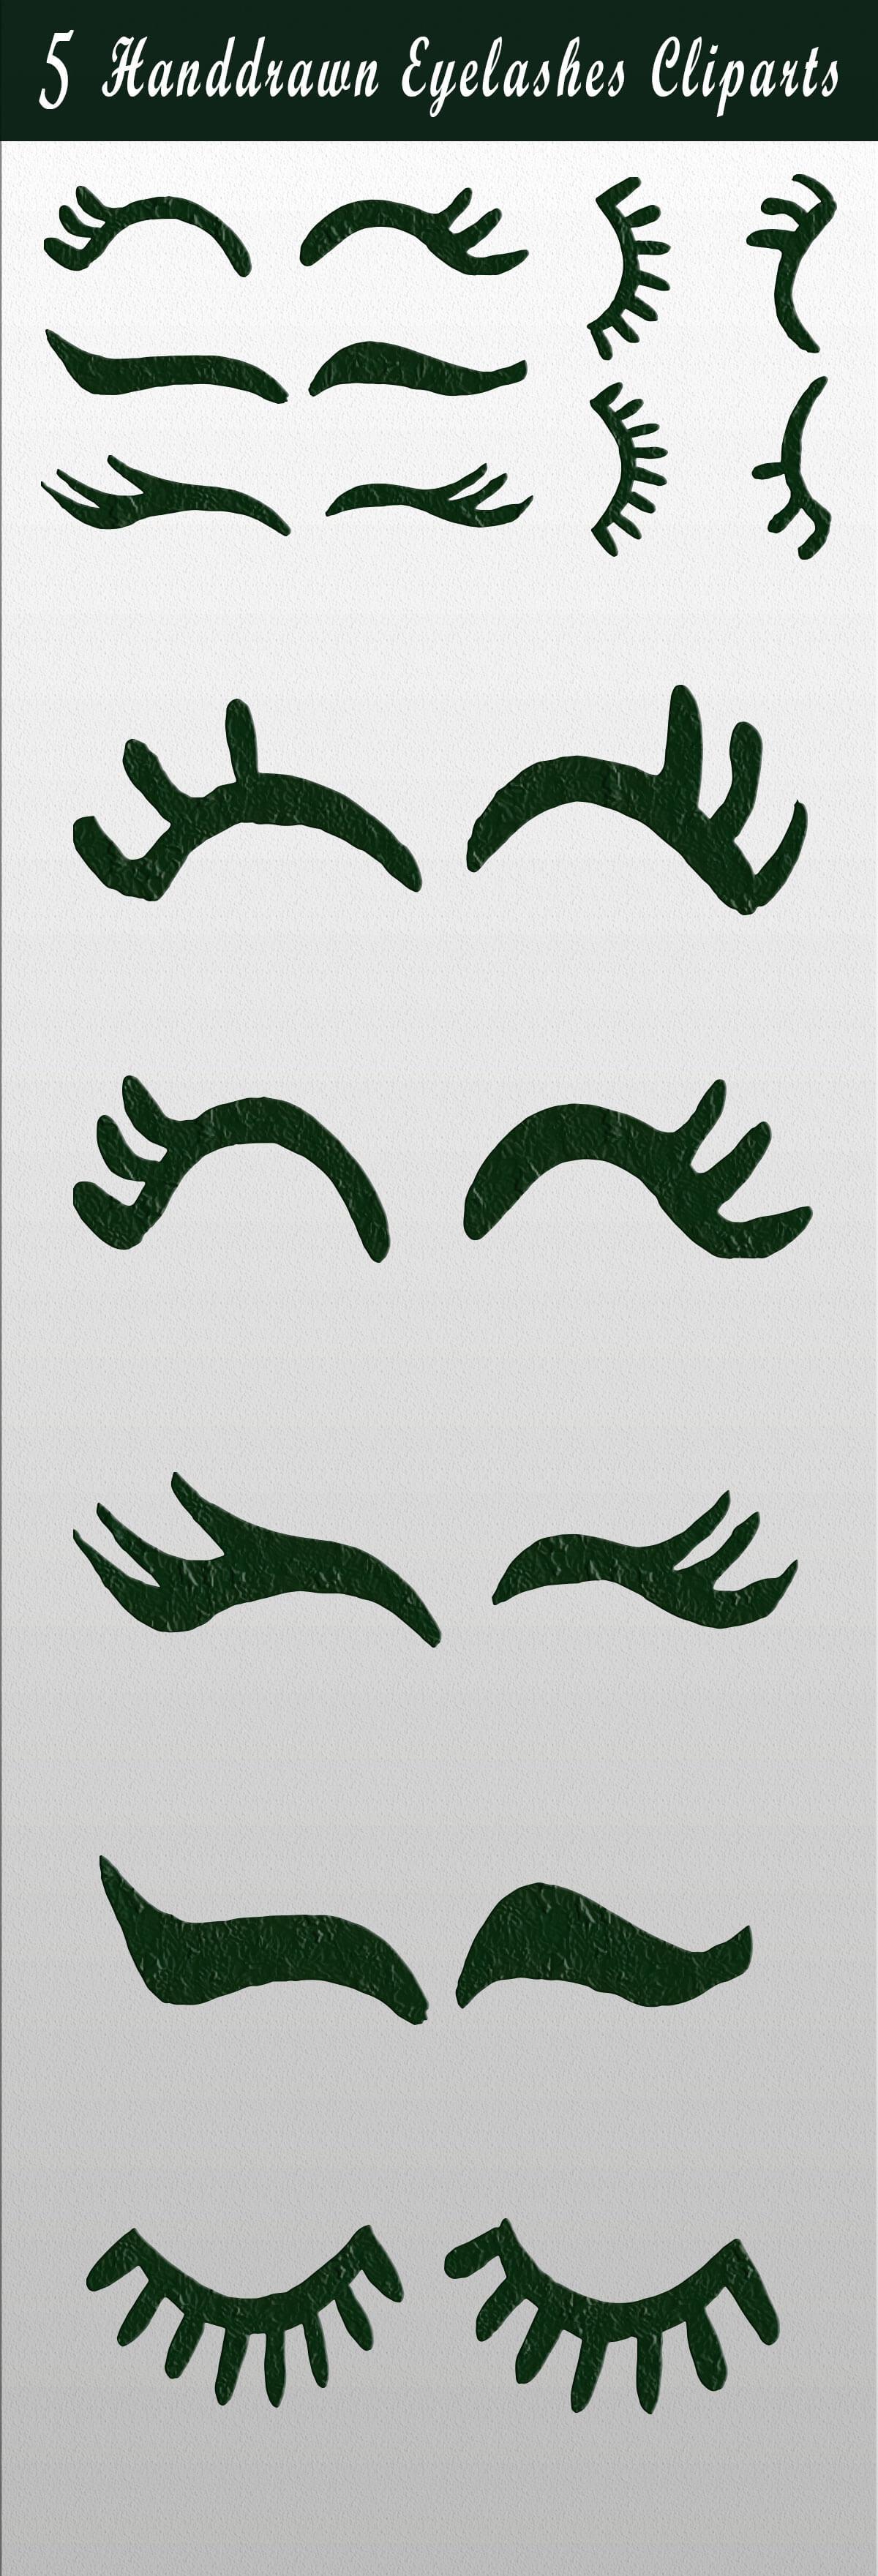 Free Handmade Eyelashes Cliparts